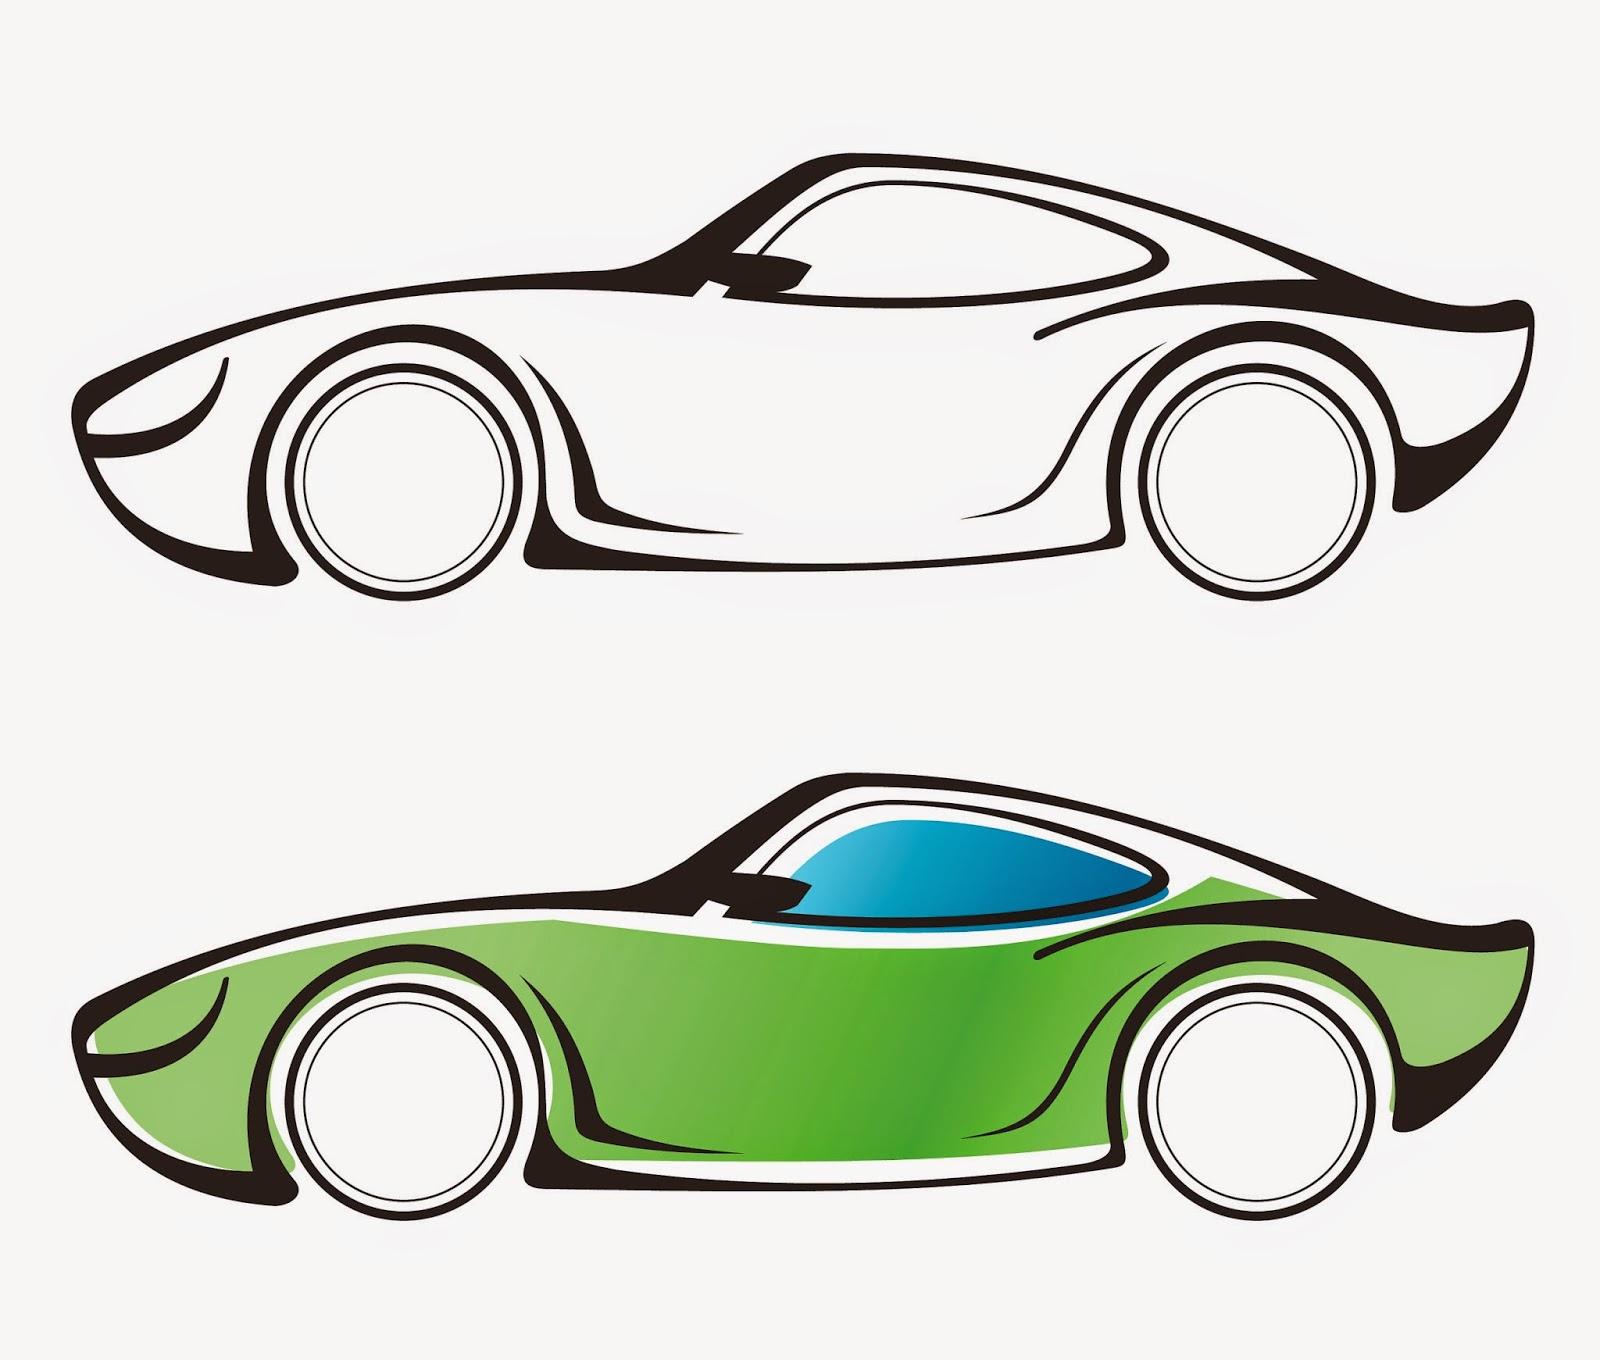 car vector drawing at getdrawings com free for personal use car rh getdrawings com car vector graphics car vector jp